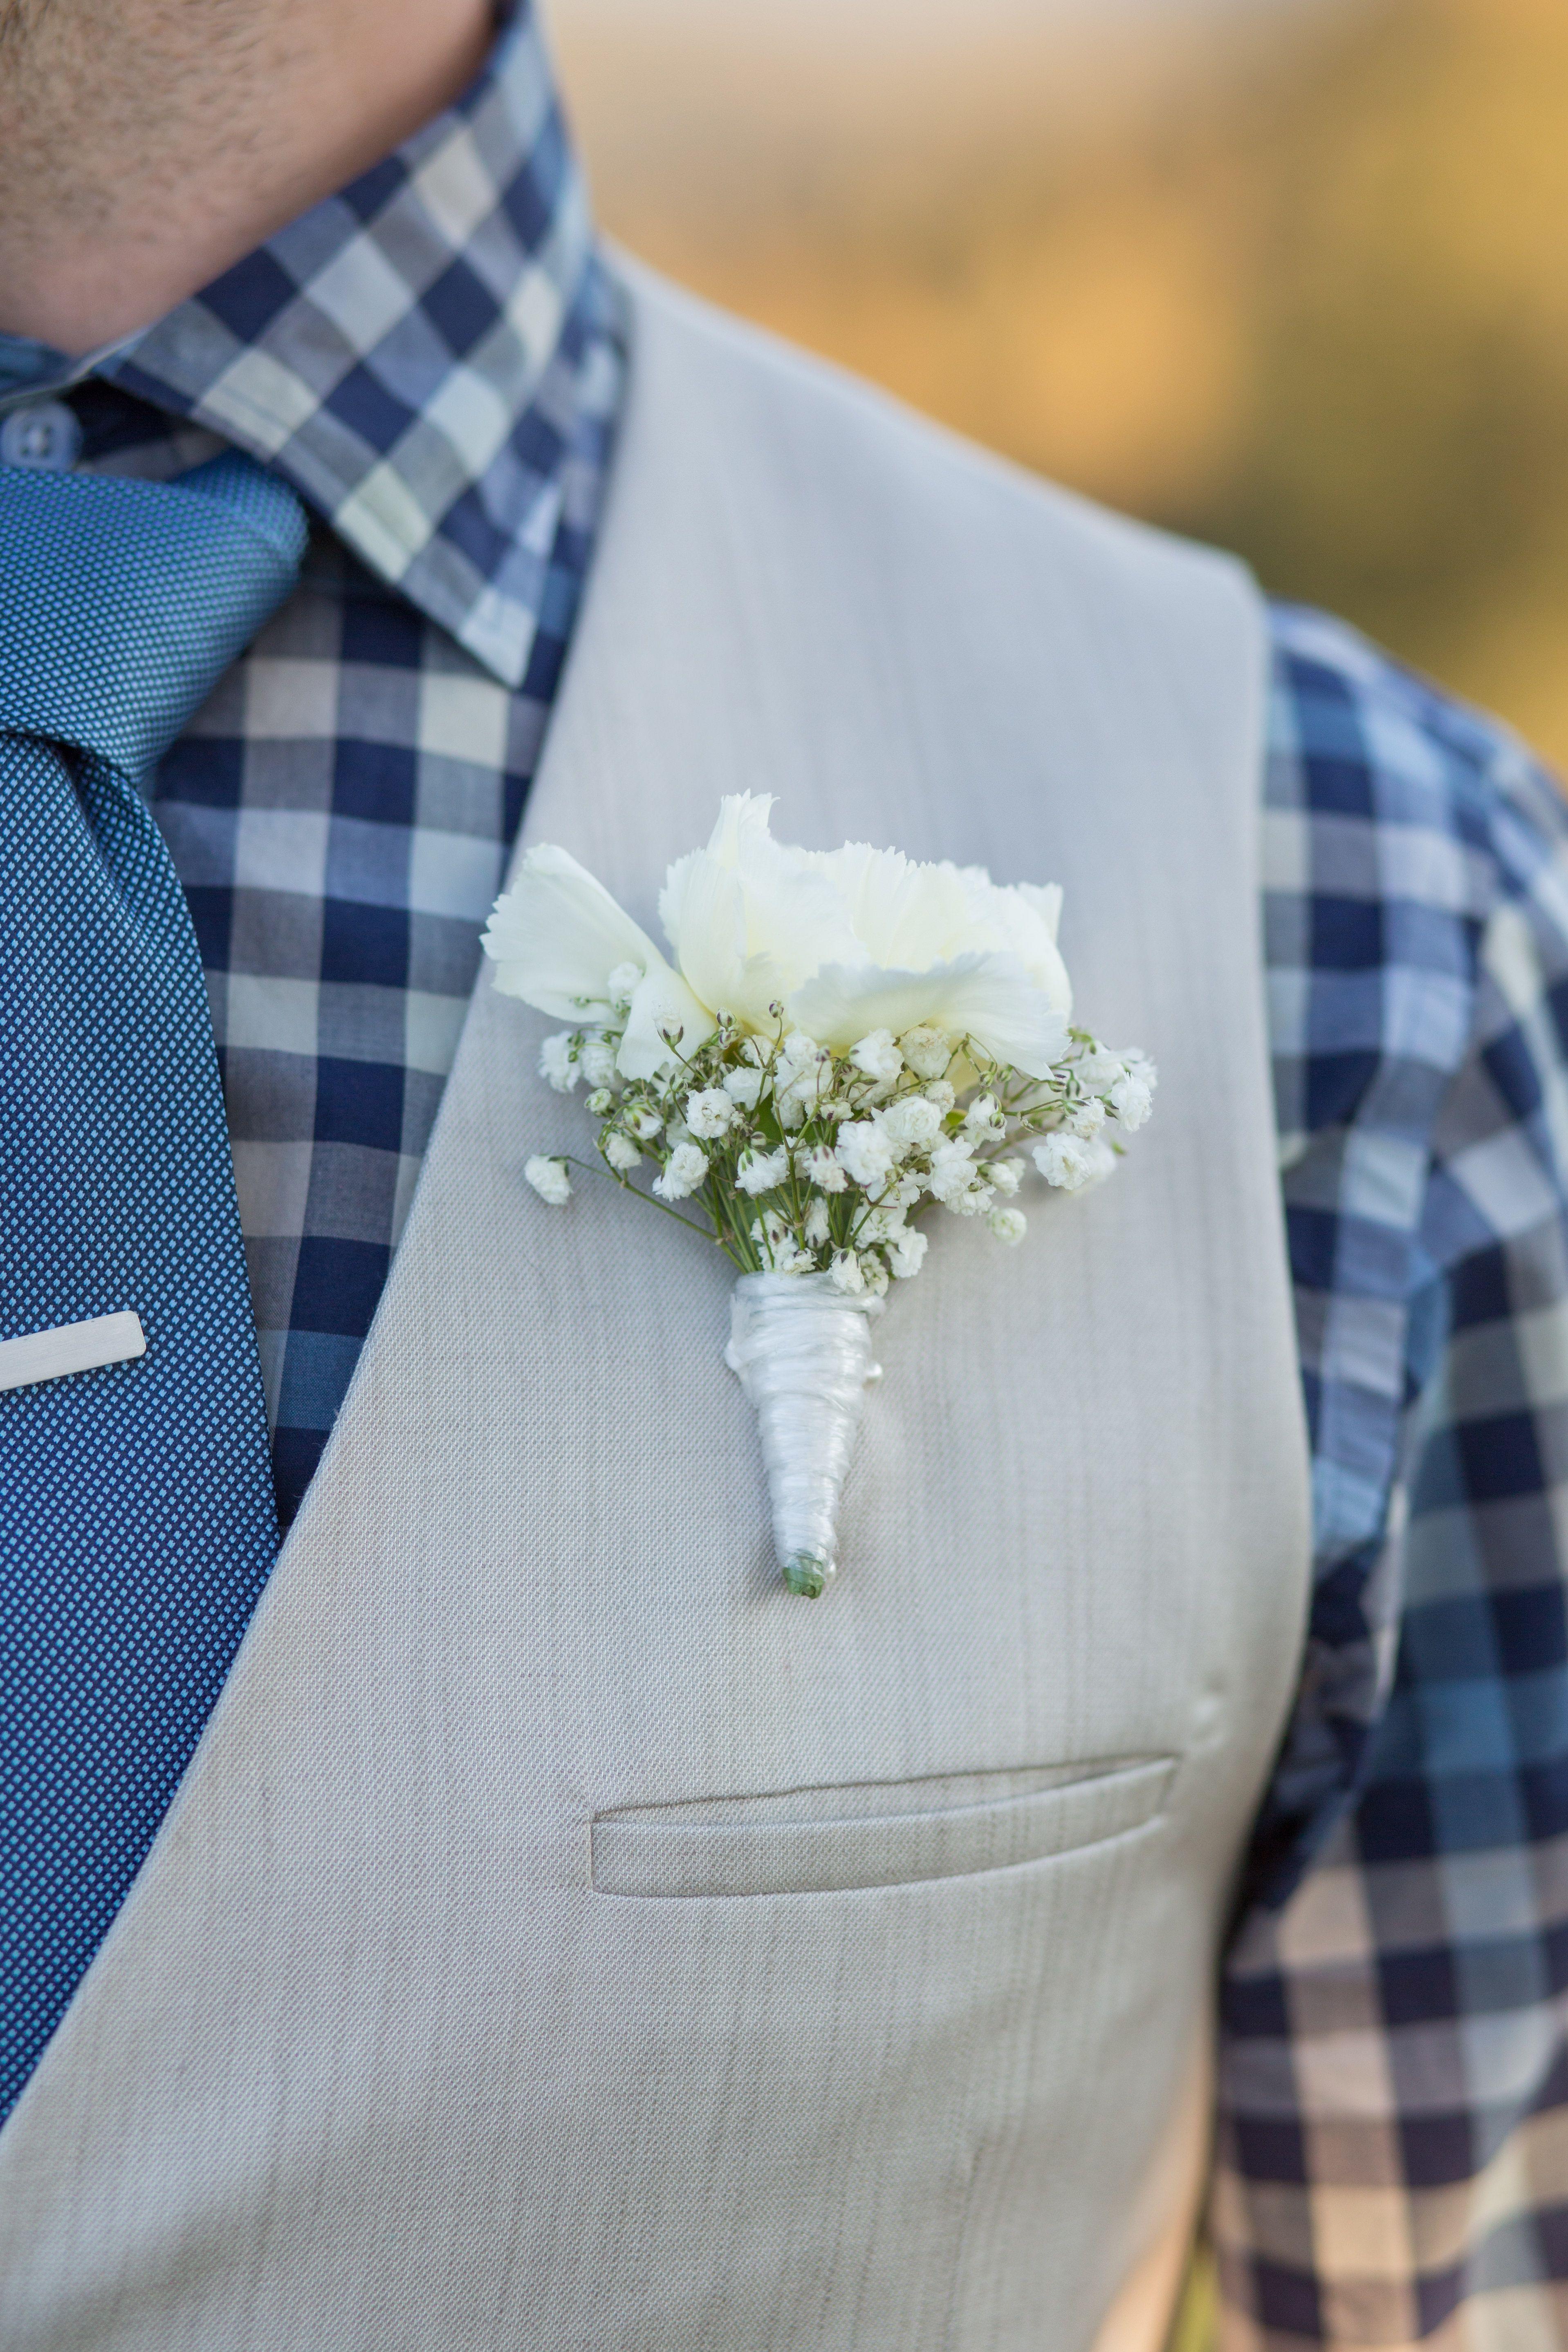 November outdoor wedding in the Australian outback . . .